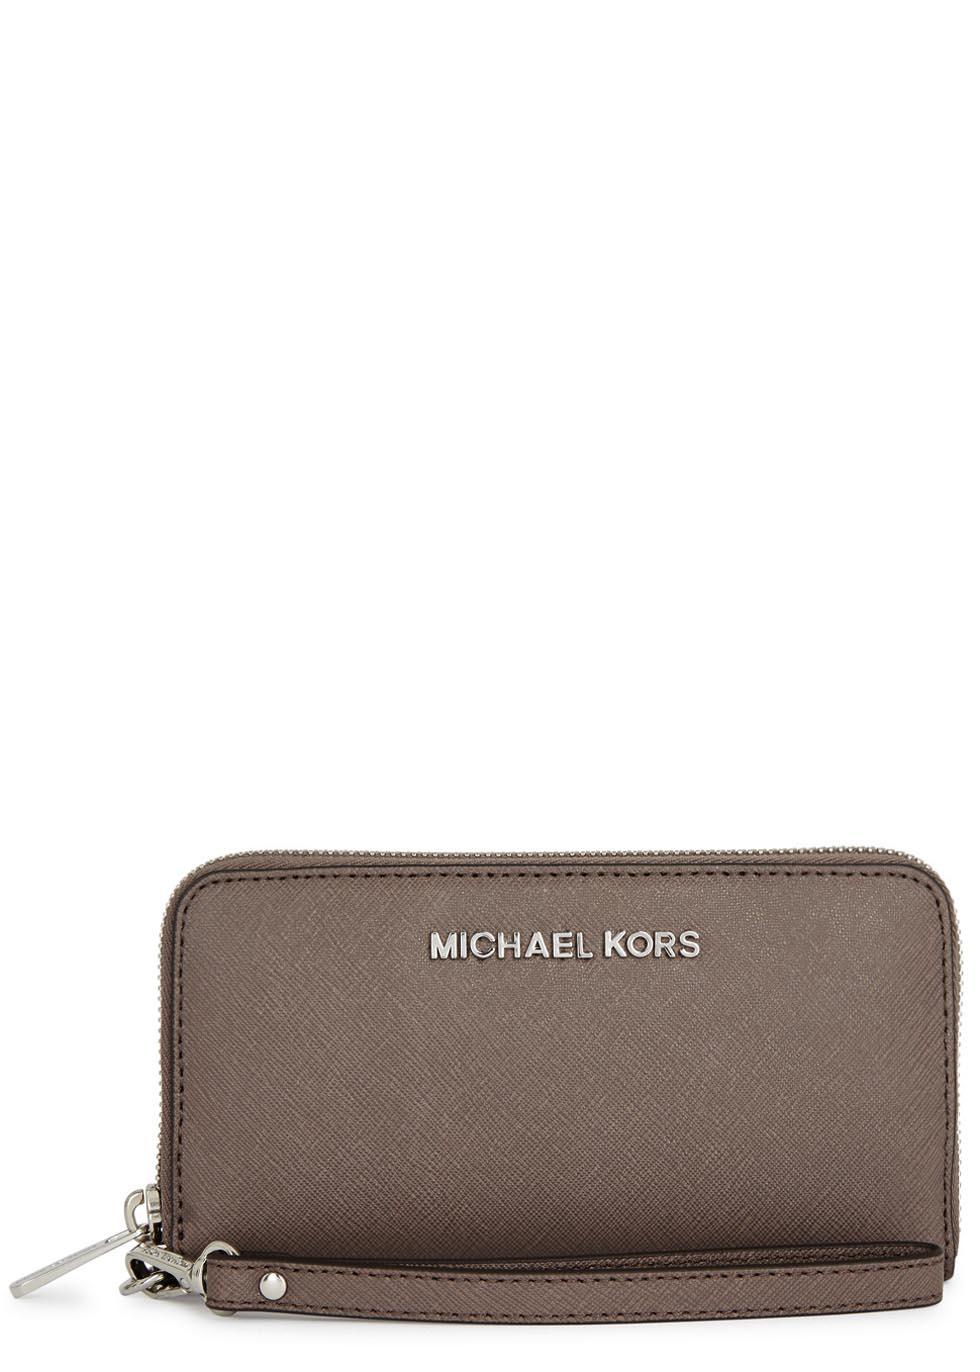 7274be05ed4e Michael Kors Jet Set Travel Mushroom Saffiano Leather Wallet in Gray ...